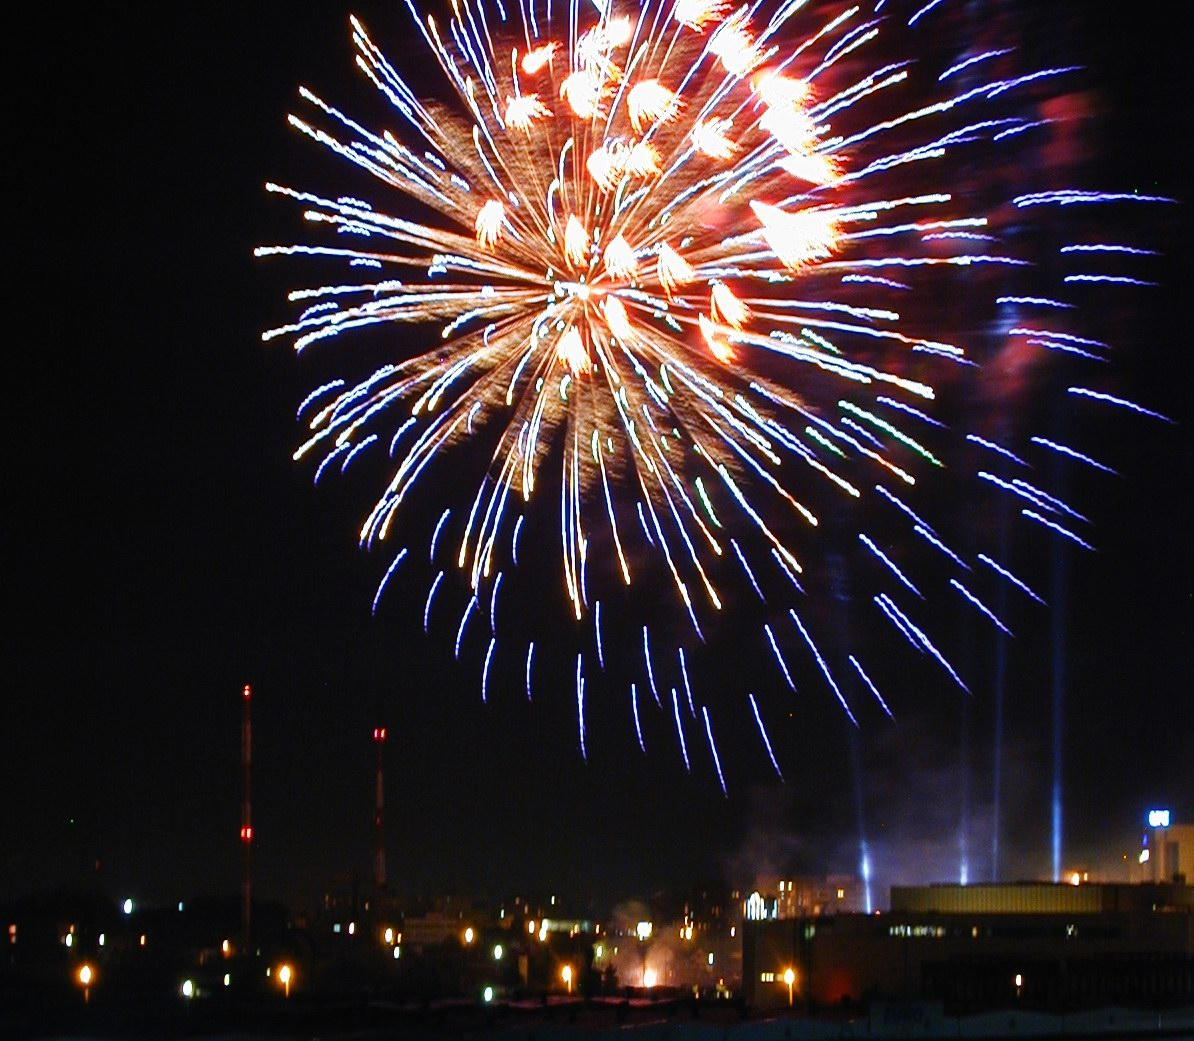 http://3.bp.blogspot.com/-X-C3dE9KIoA/TiGpGEjPfjI/AAAAAAAACsE/snj7lhMwVxg/s1600/fireworks-wallpaper-wallpaper-download-6.jpg